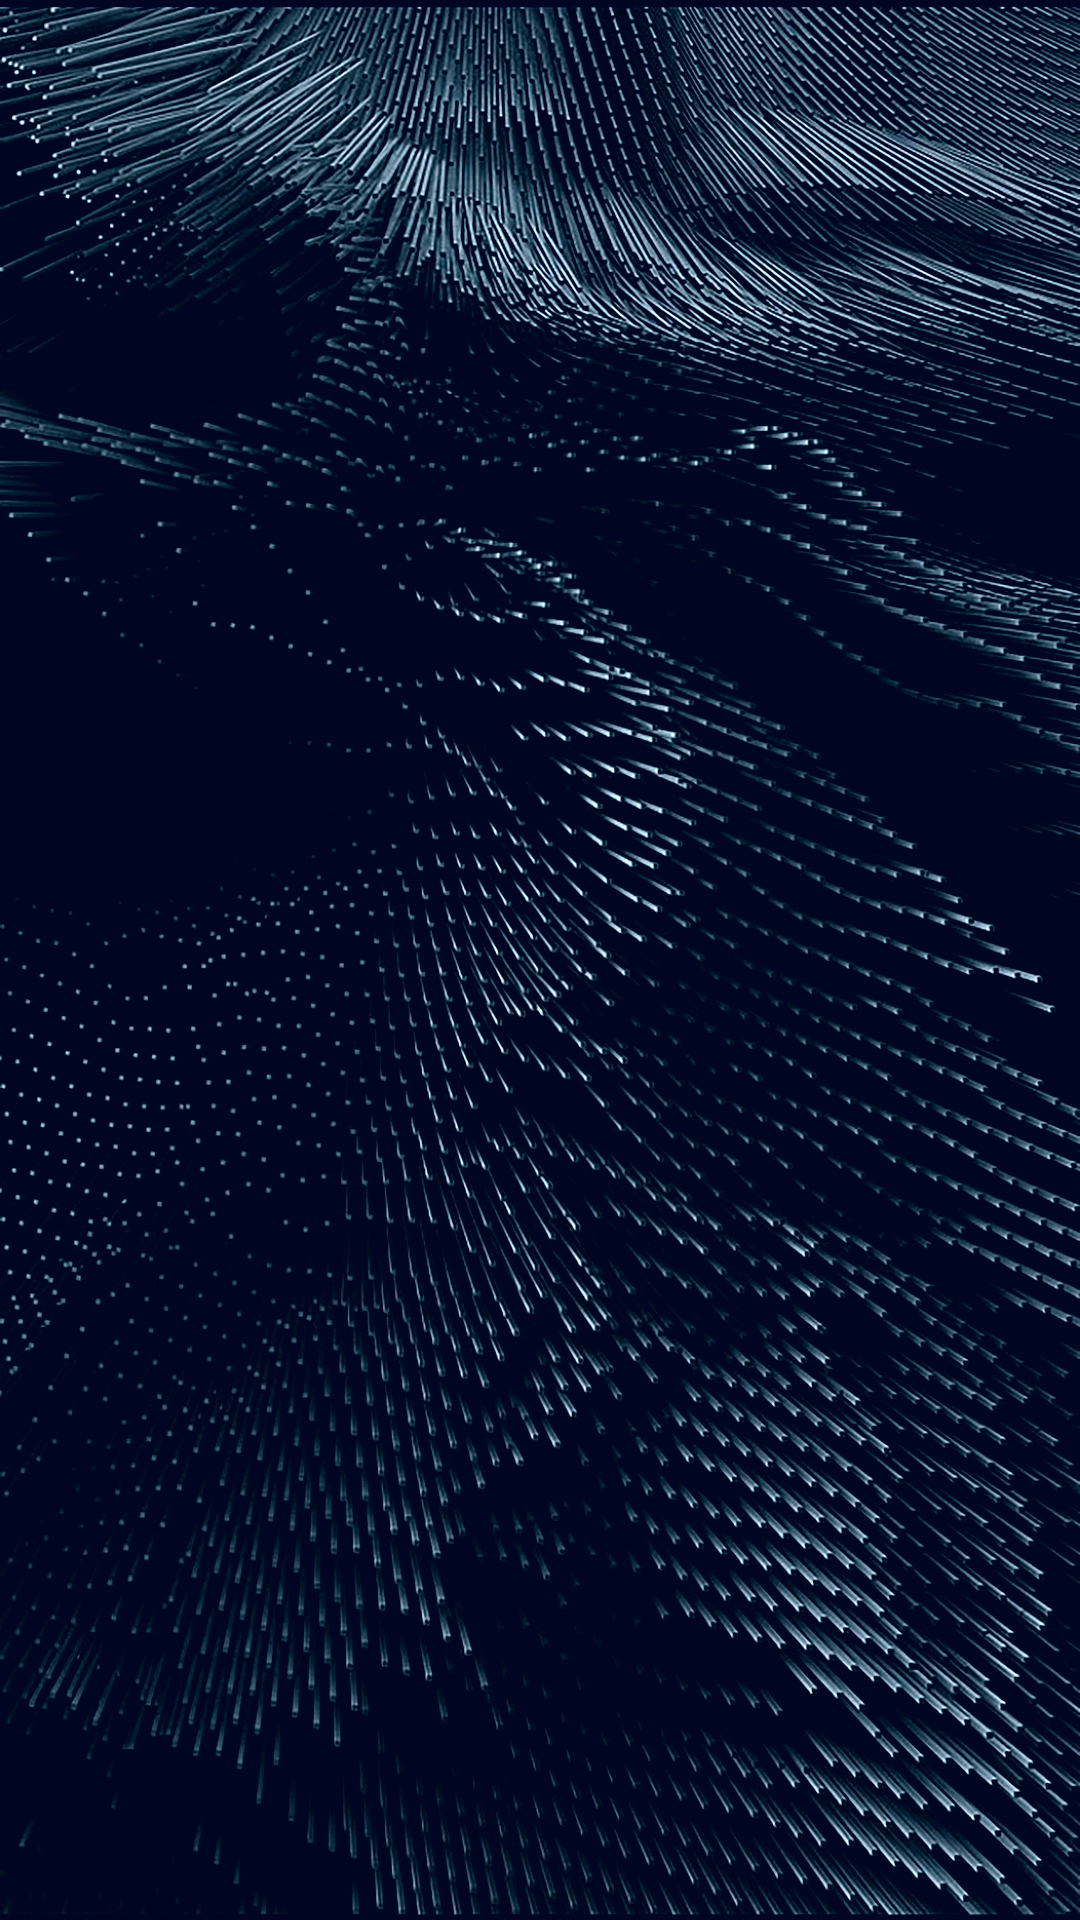 3d Waves Clintonfitch Com